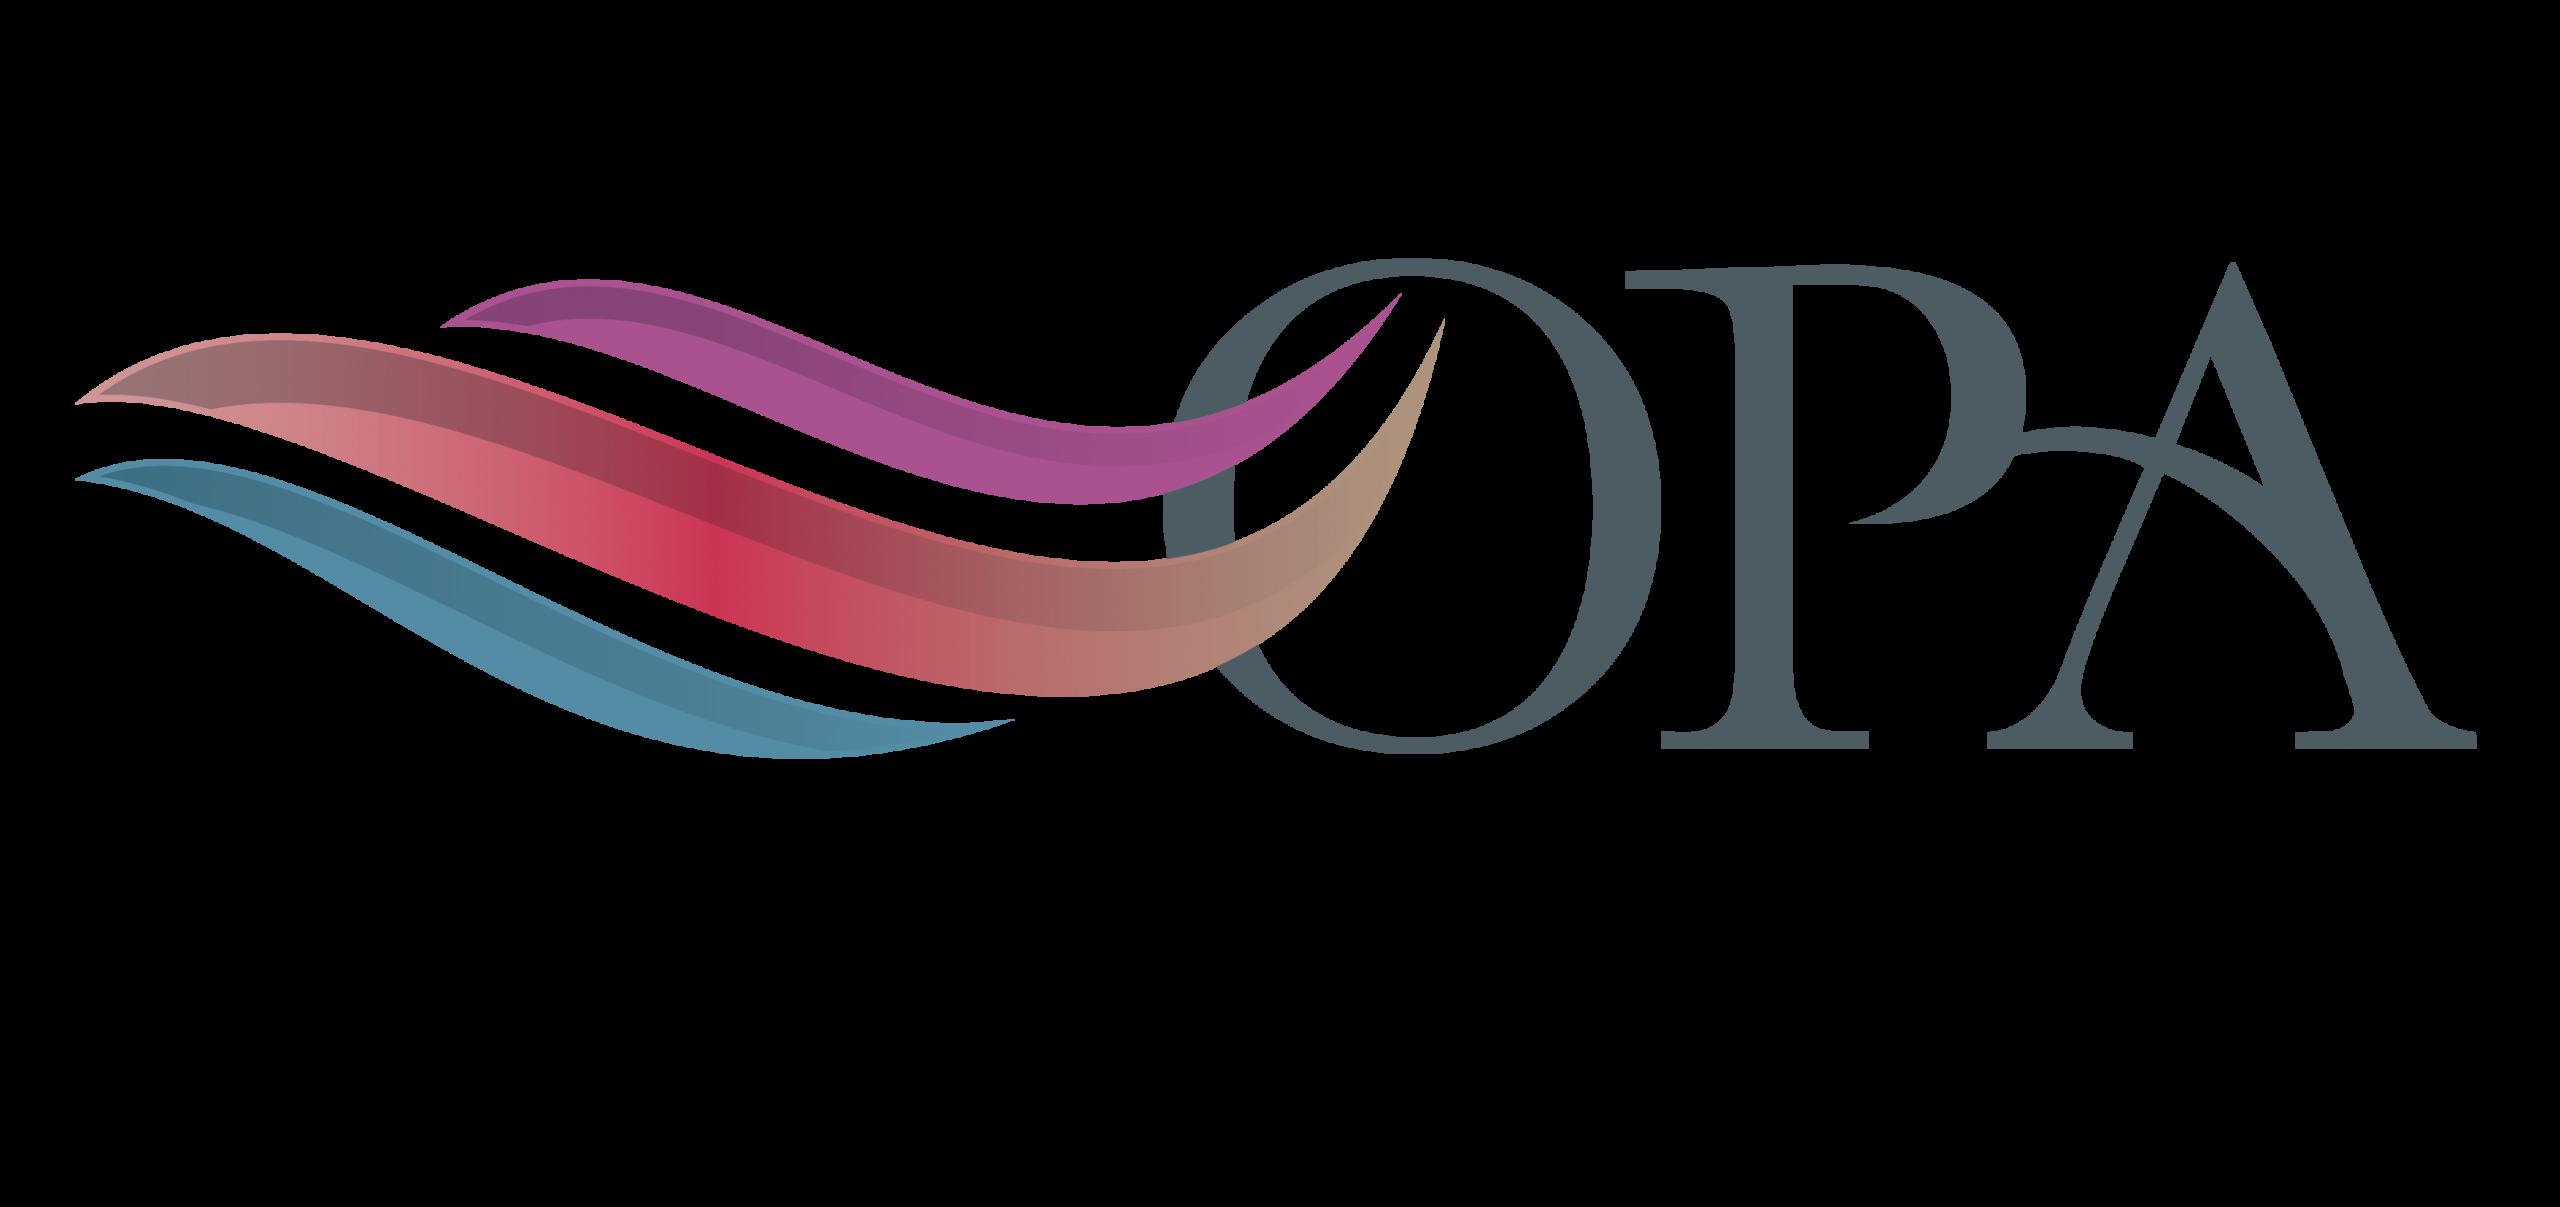 Accademia Venusia partnership accrediti Onicotecnici Professionisti Associati OPA